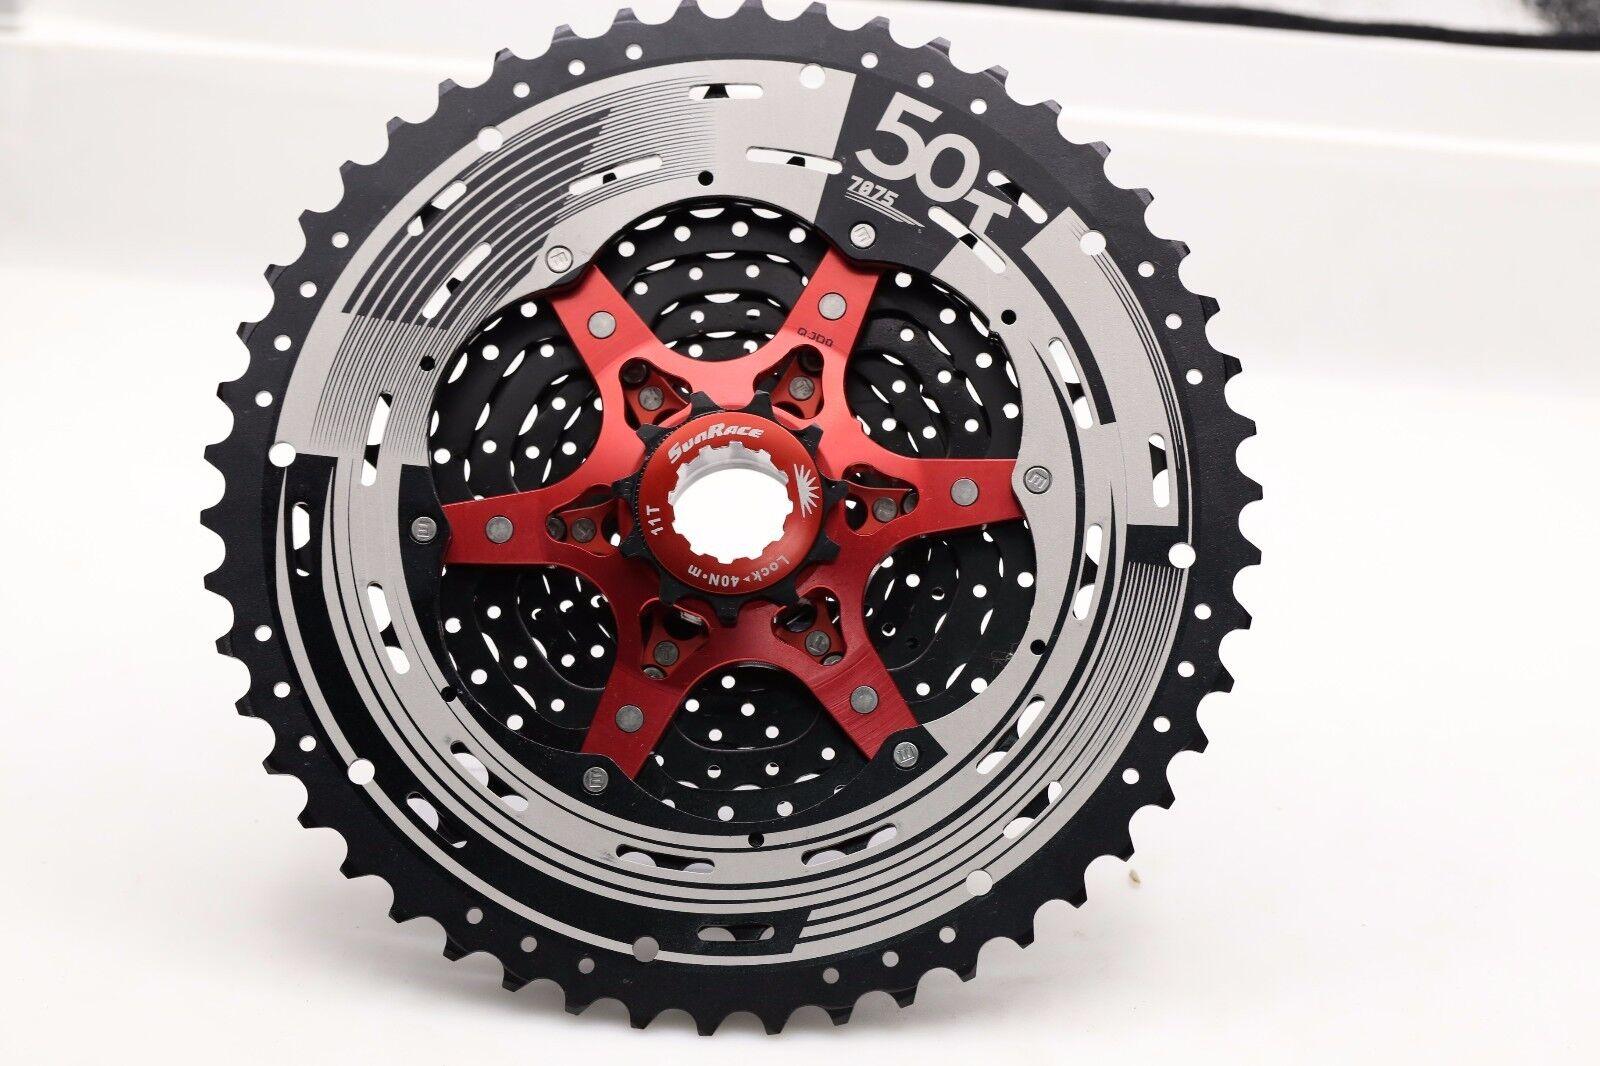 2018 Sunrace 12Speed CSMZ90 11-50T Cassette Bicycle Wide Ratio MTB Freewheel